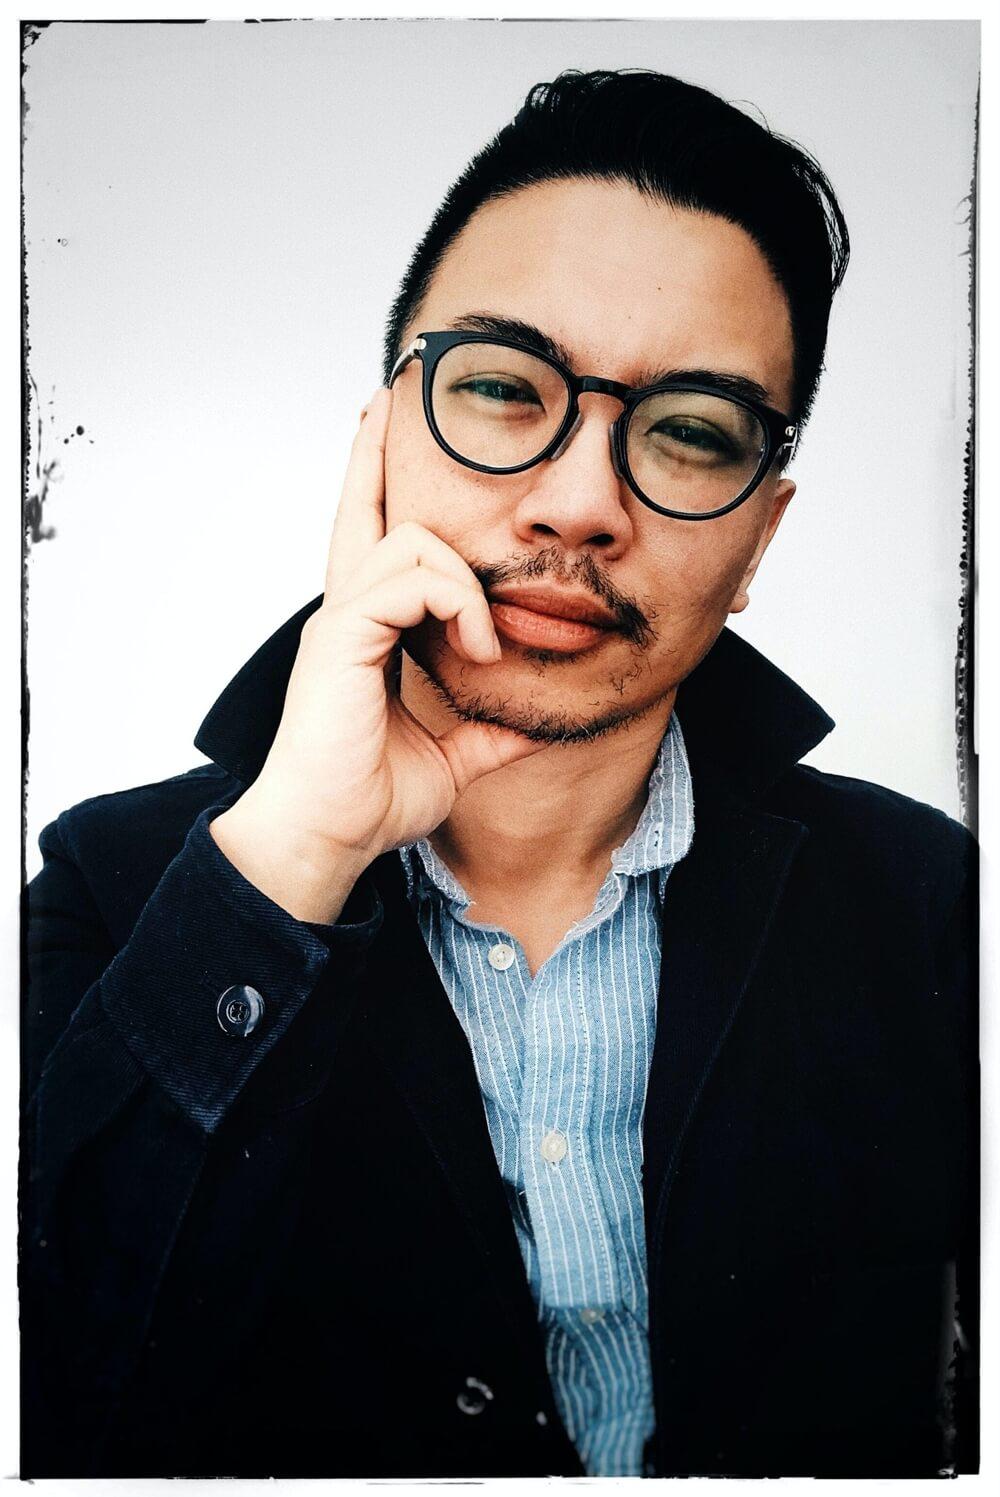 Personal stylist Peter Nguyen